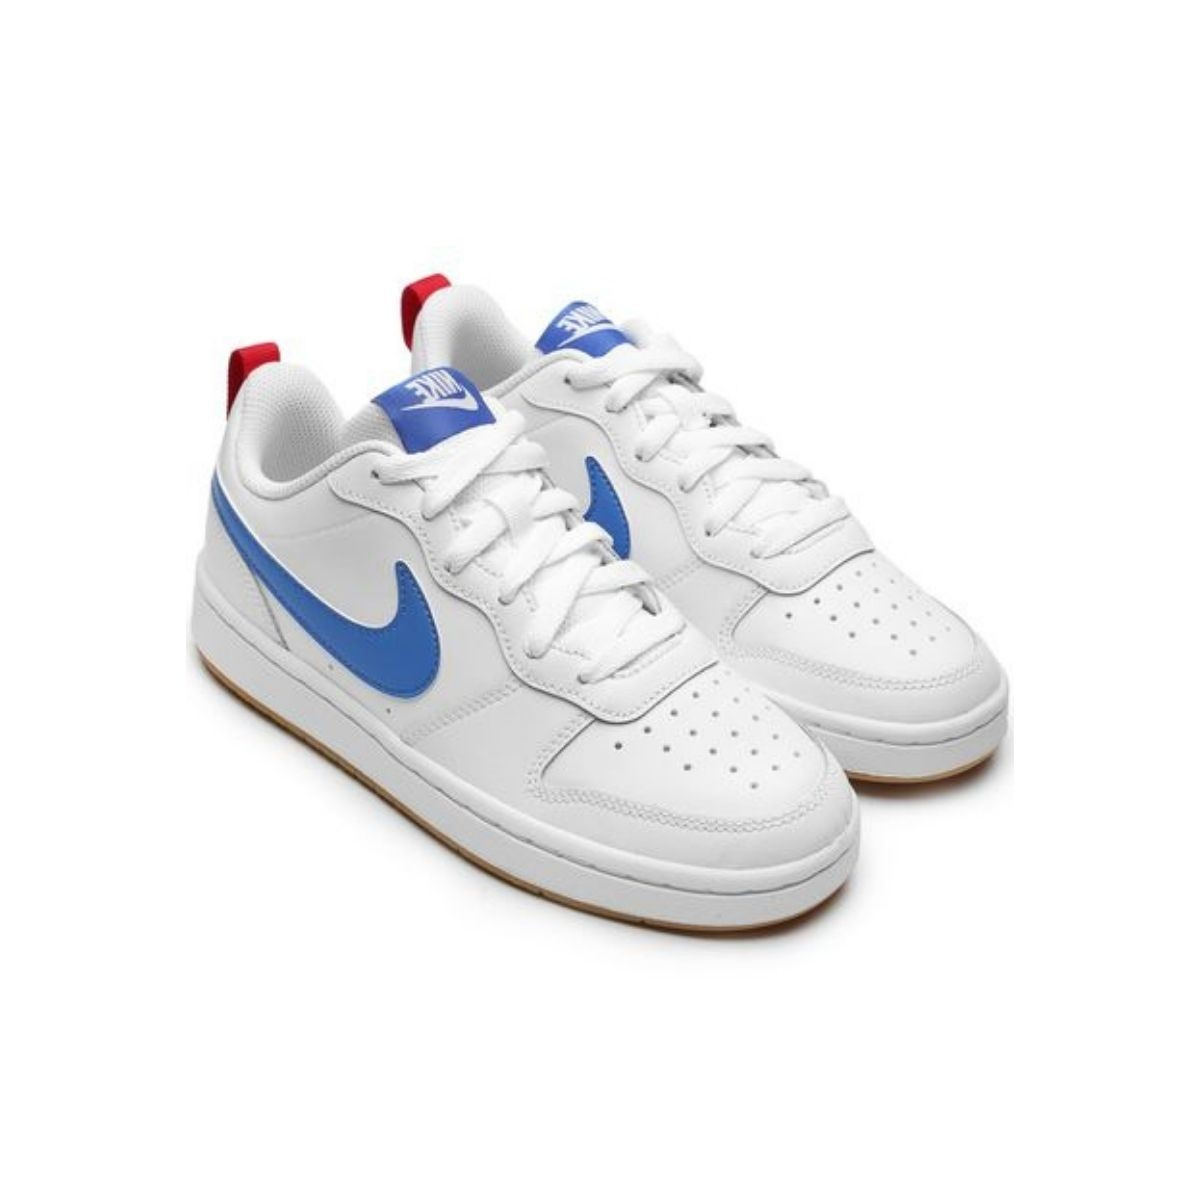 Tenis Masculino Juvenil Nike Court Borough Low Branco